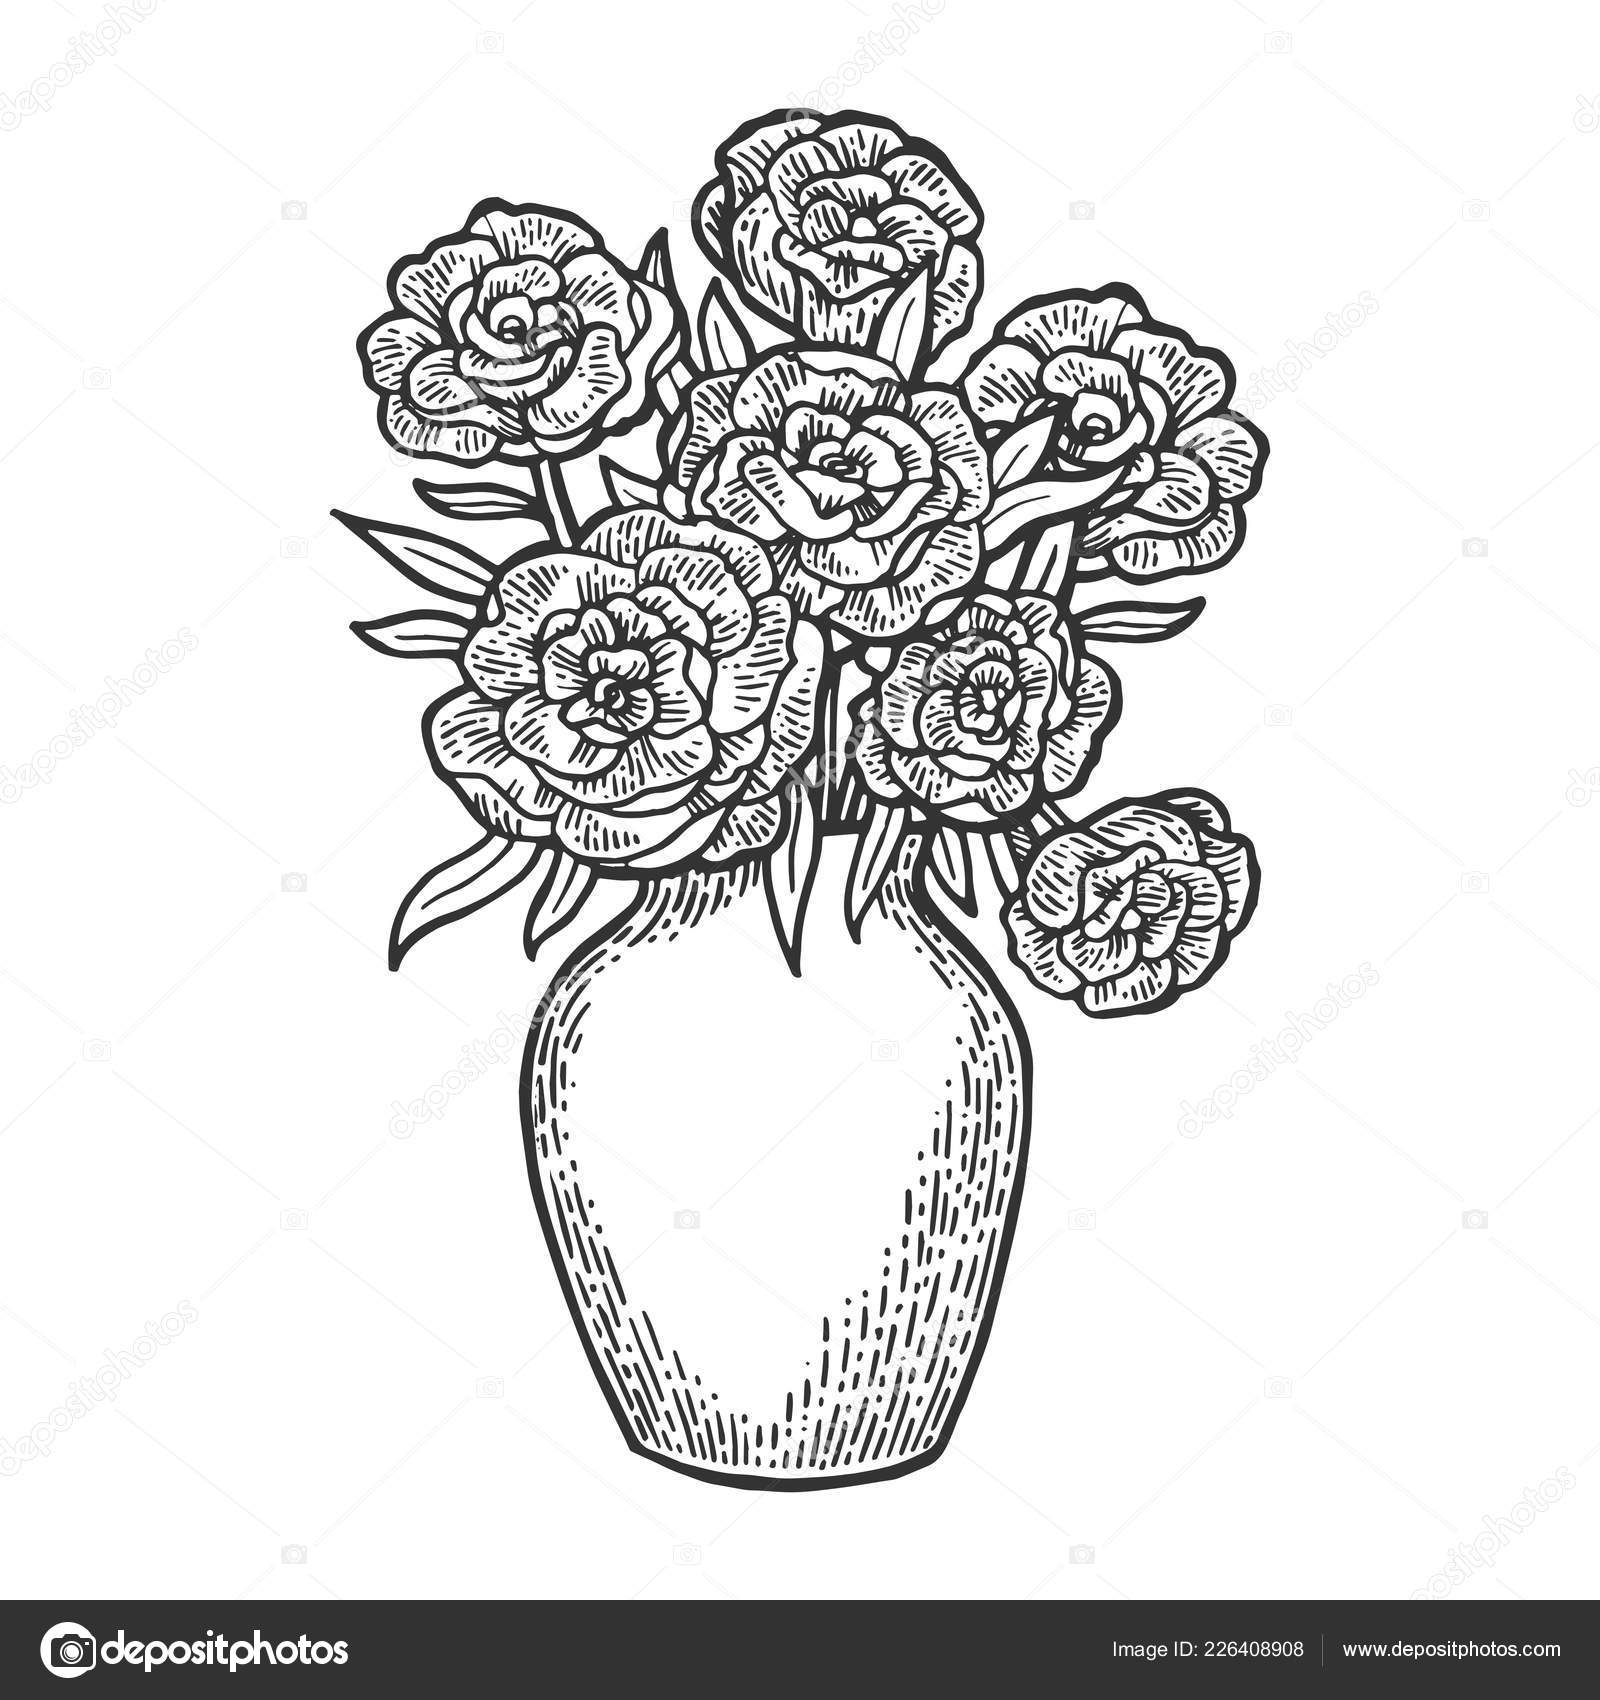 231 & Flowers in vase engraving vector illustration. Scratch board ...